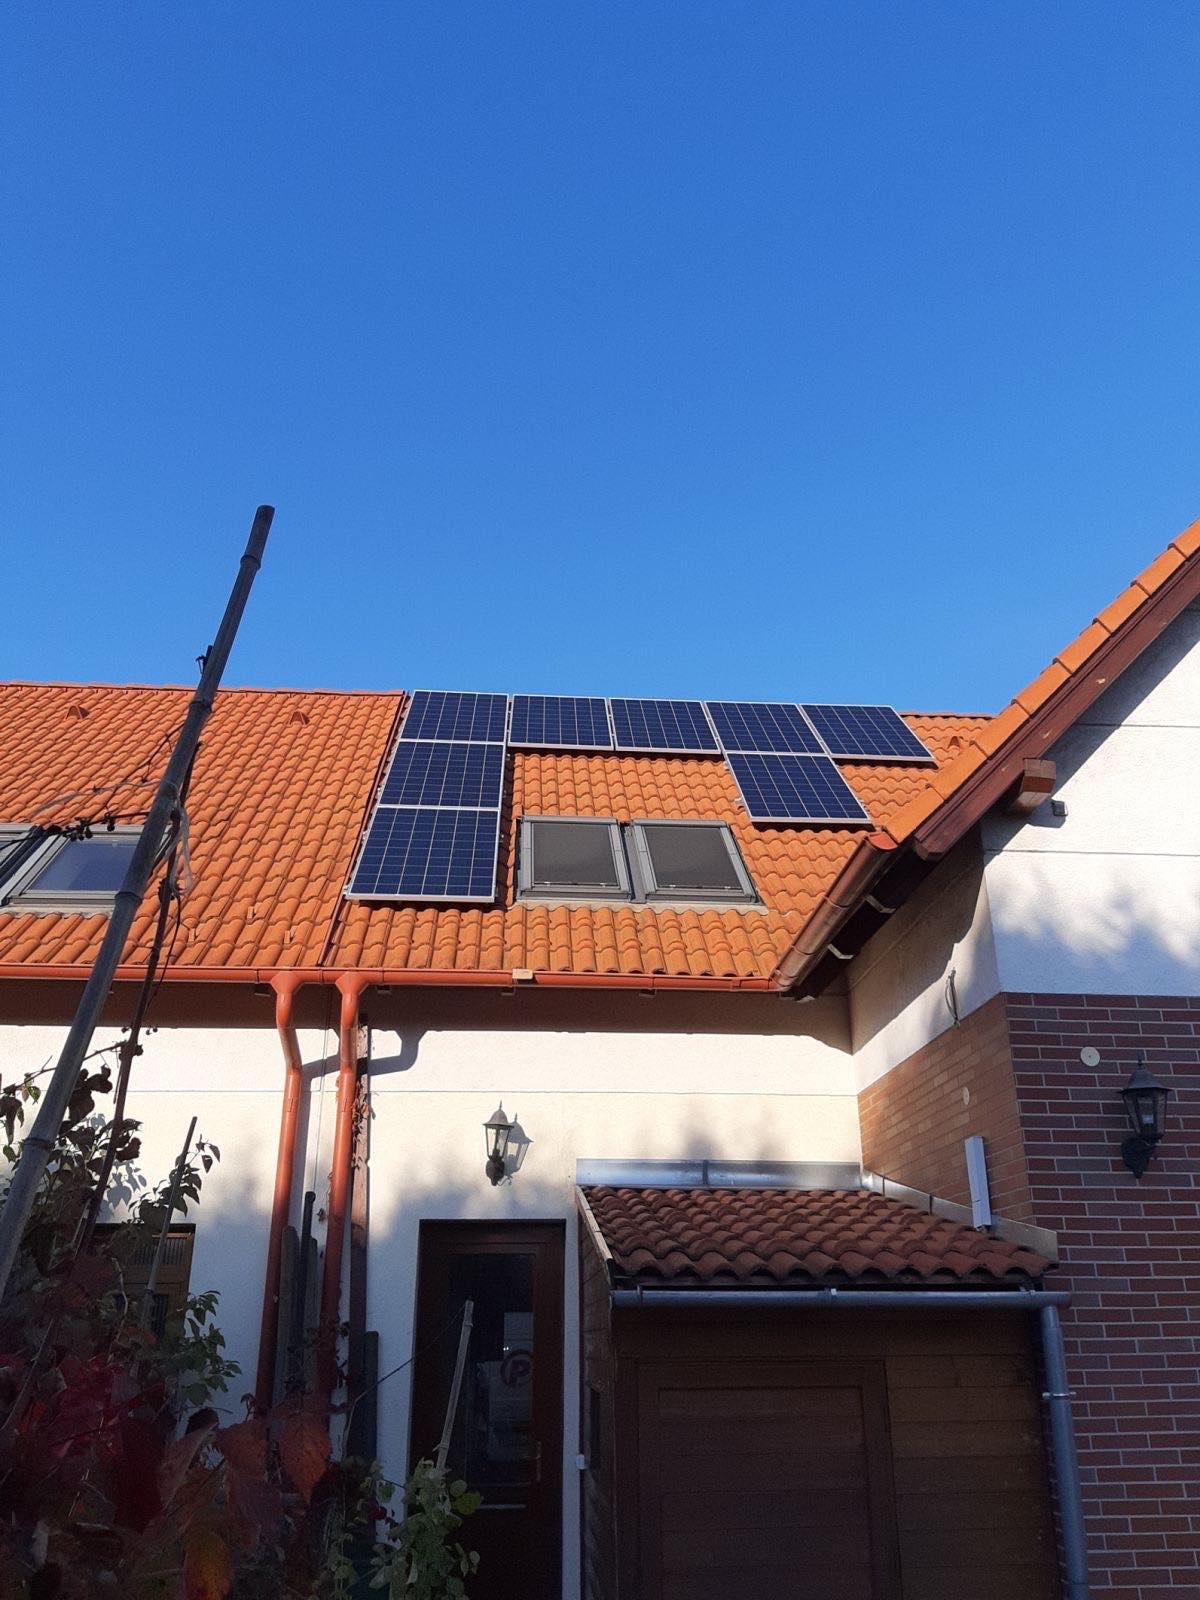 Budapest 4,4 KWP teljesítményű napelemes rendszer